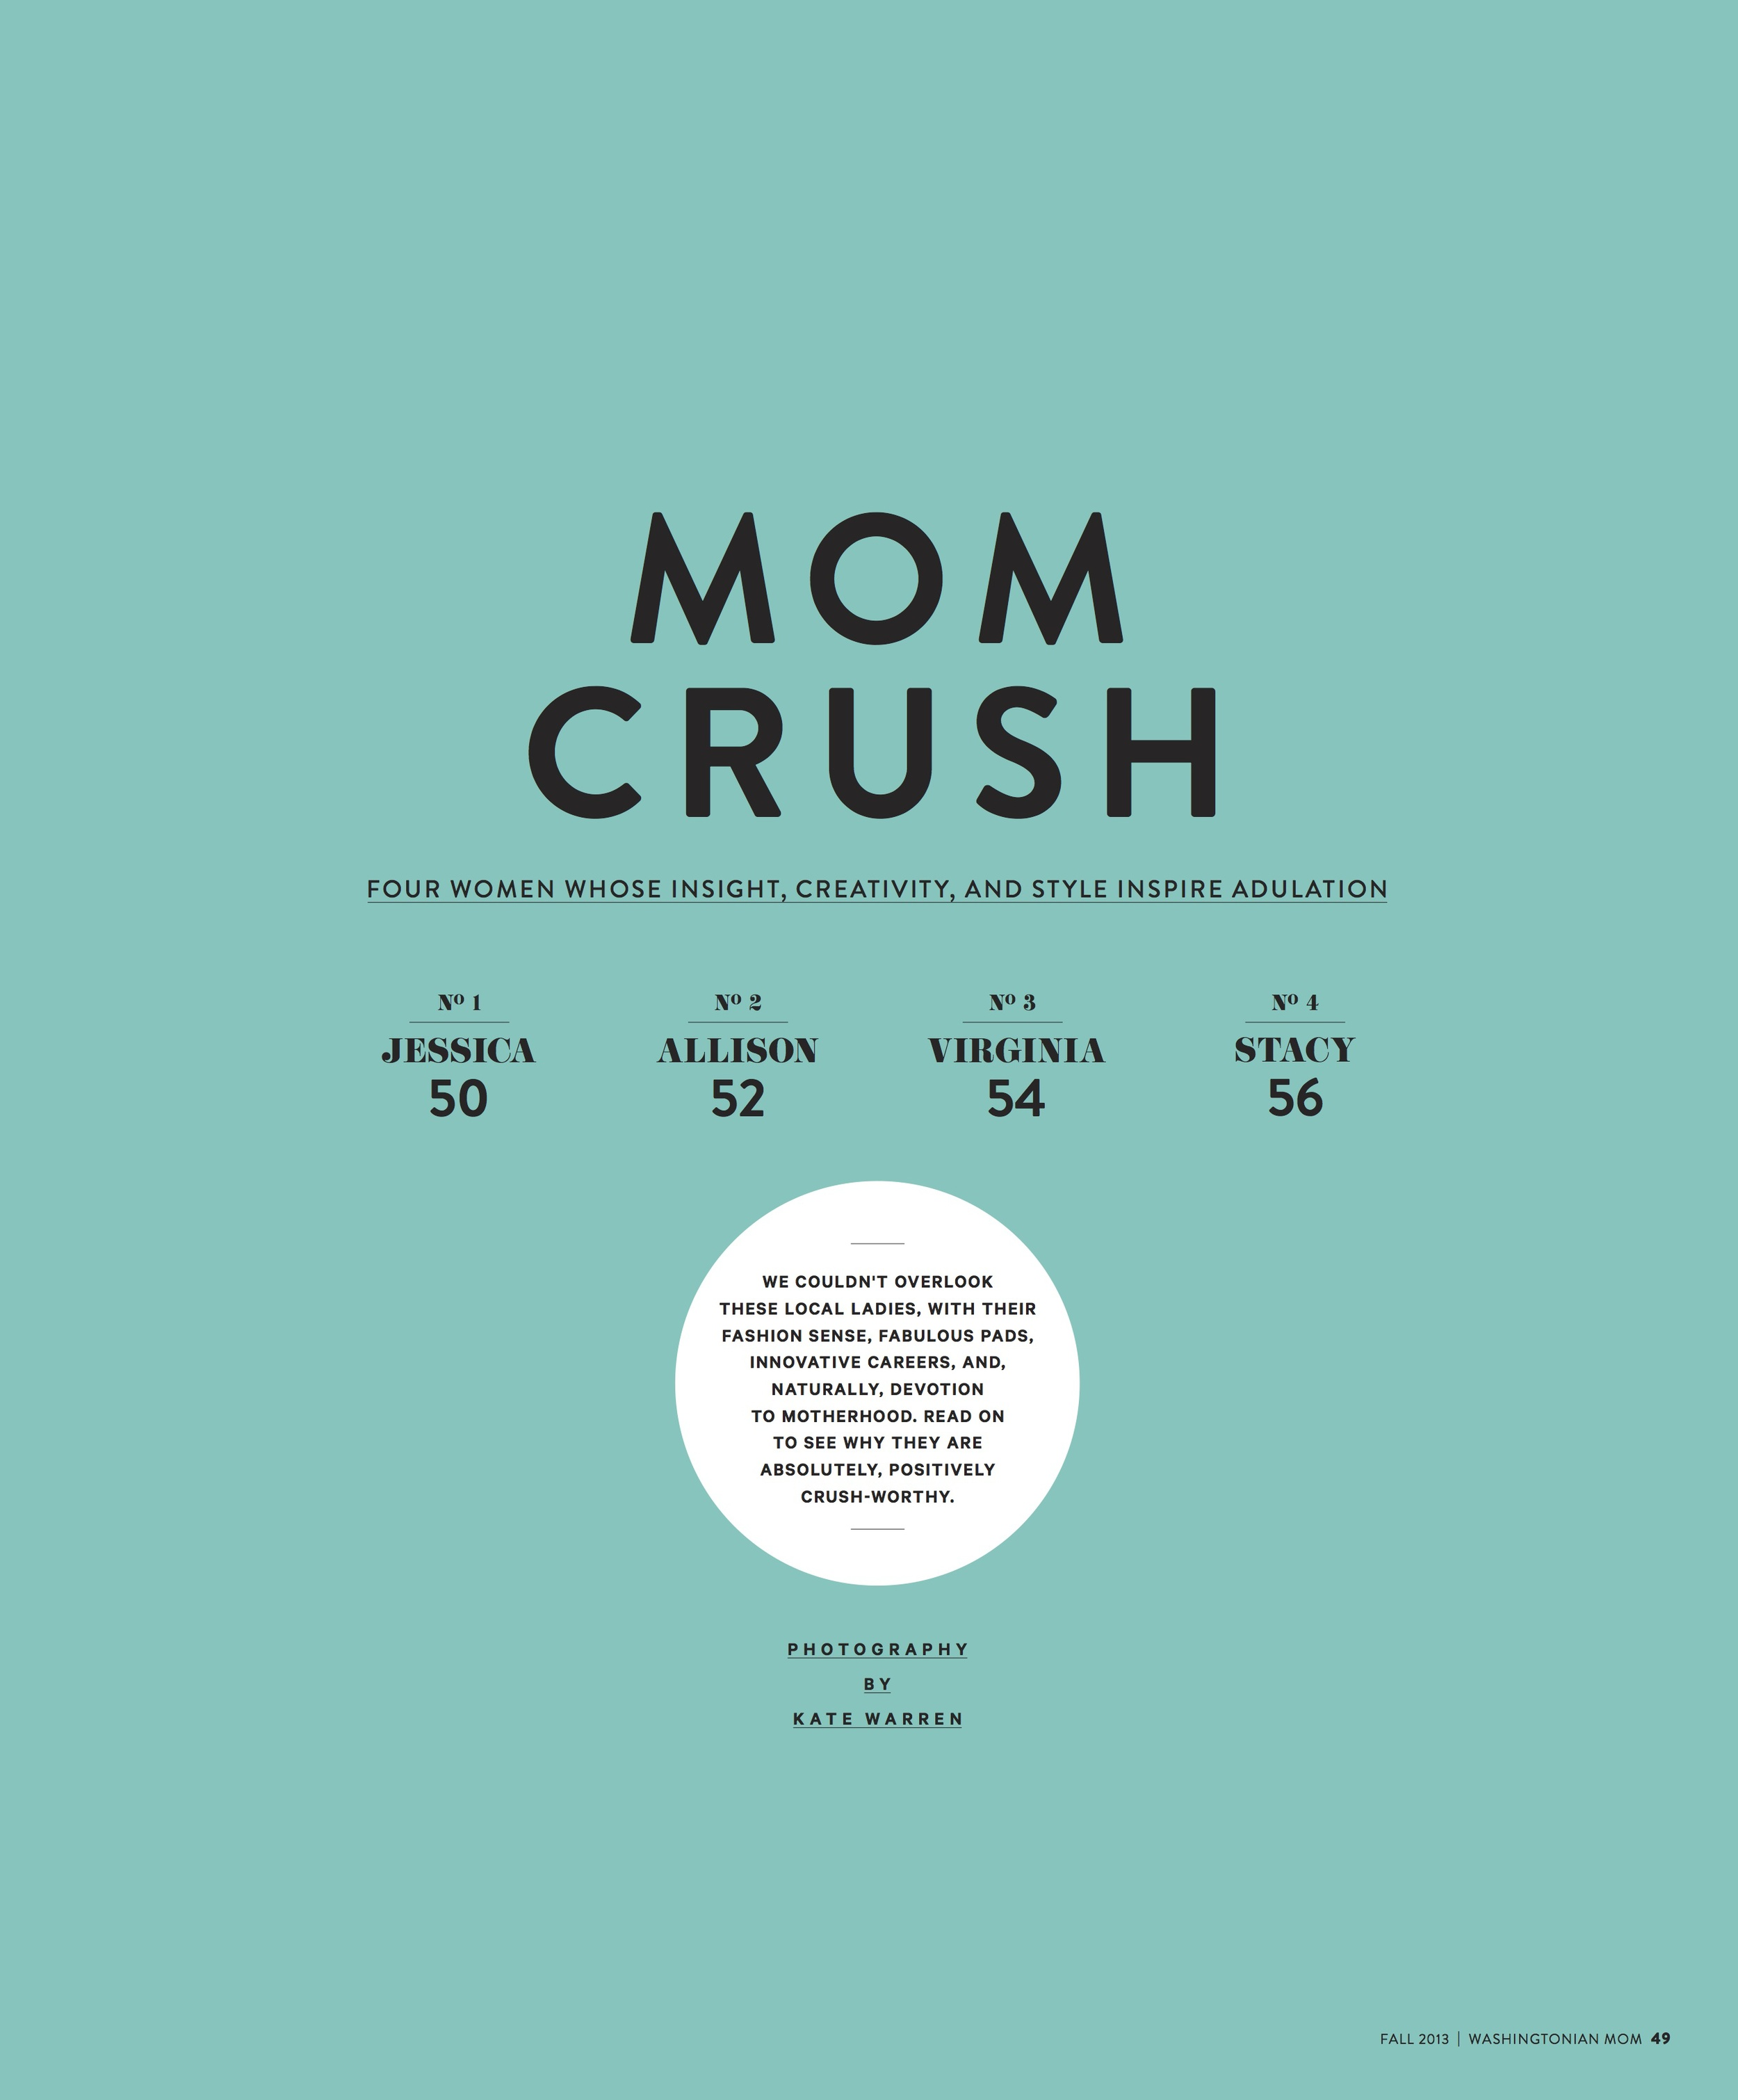 MOM_49_MomCrush_Opening_Rd3Fall2013.jpg